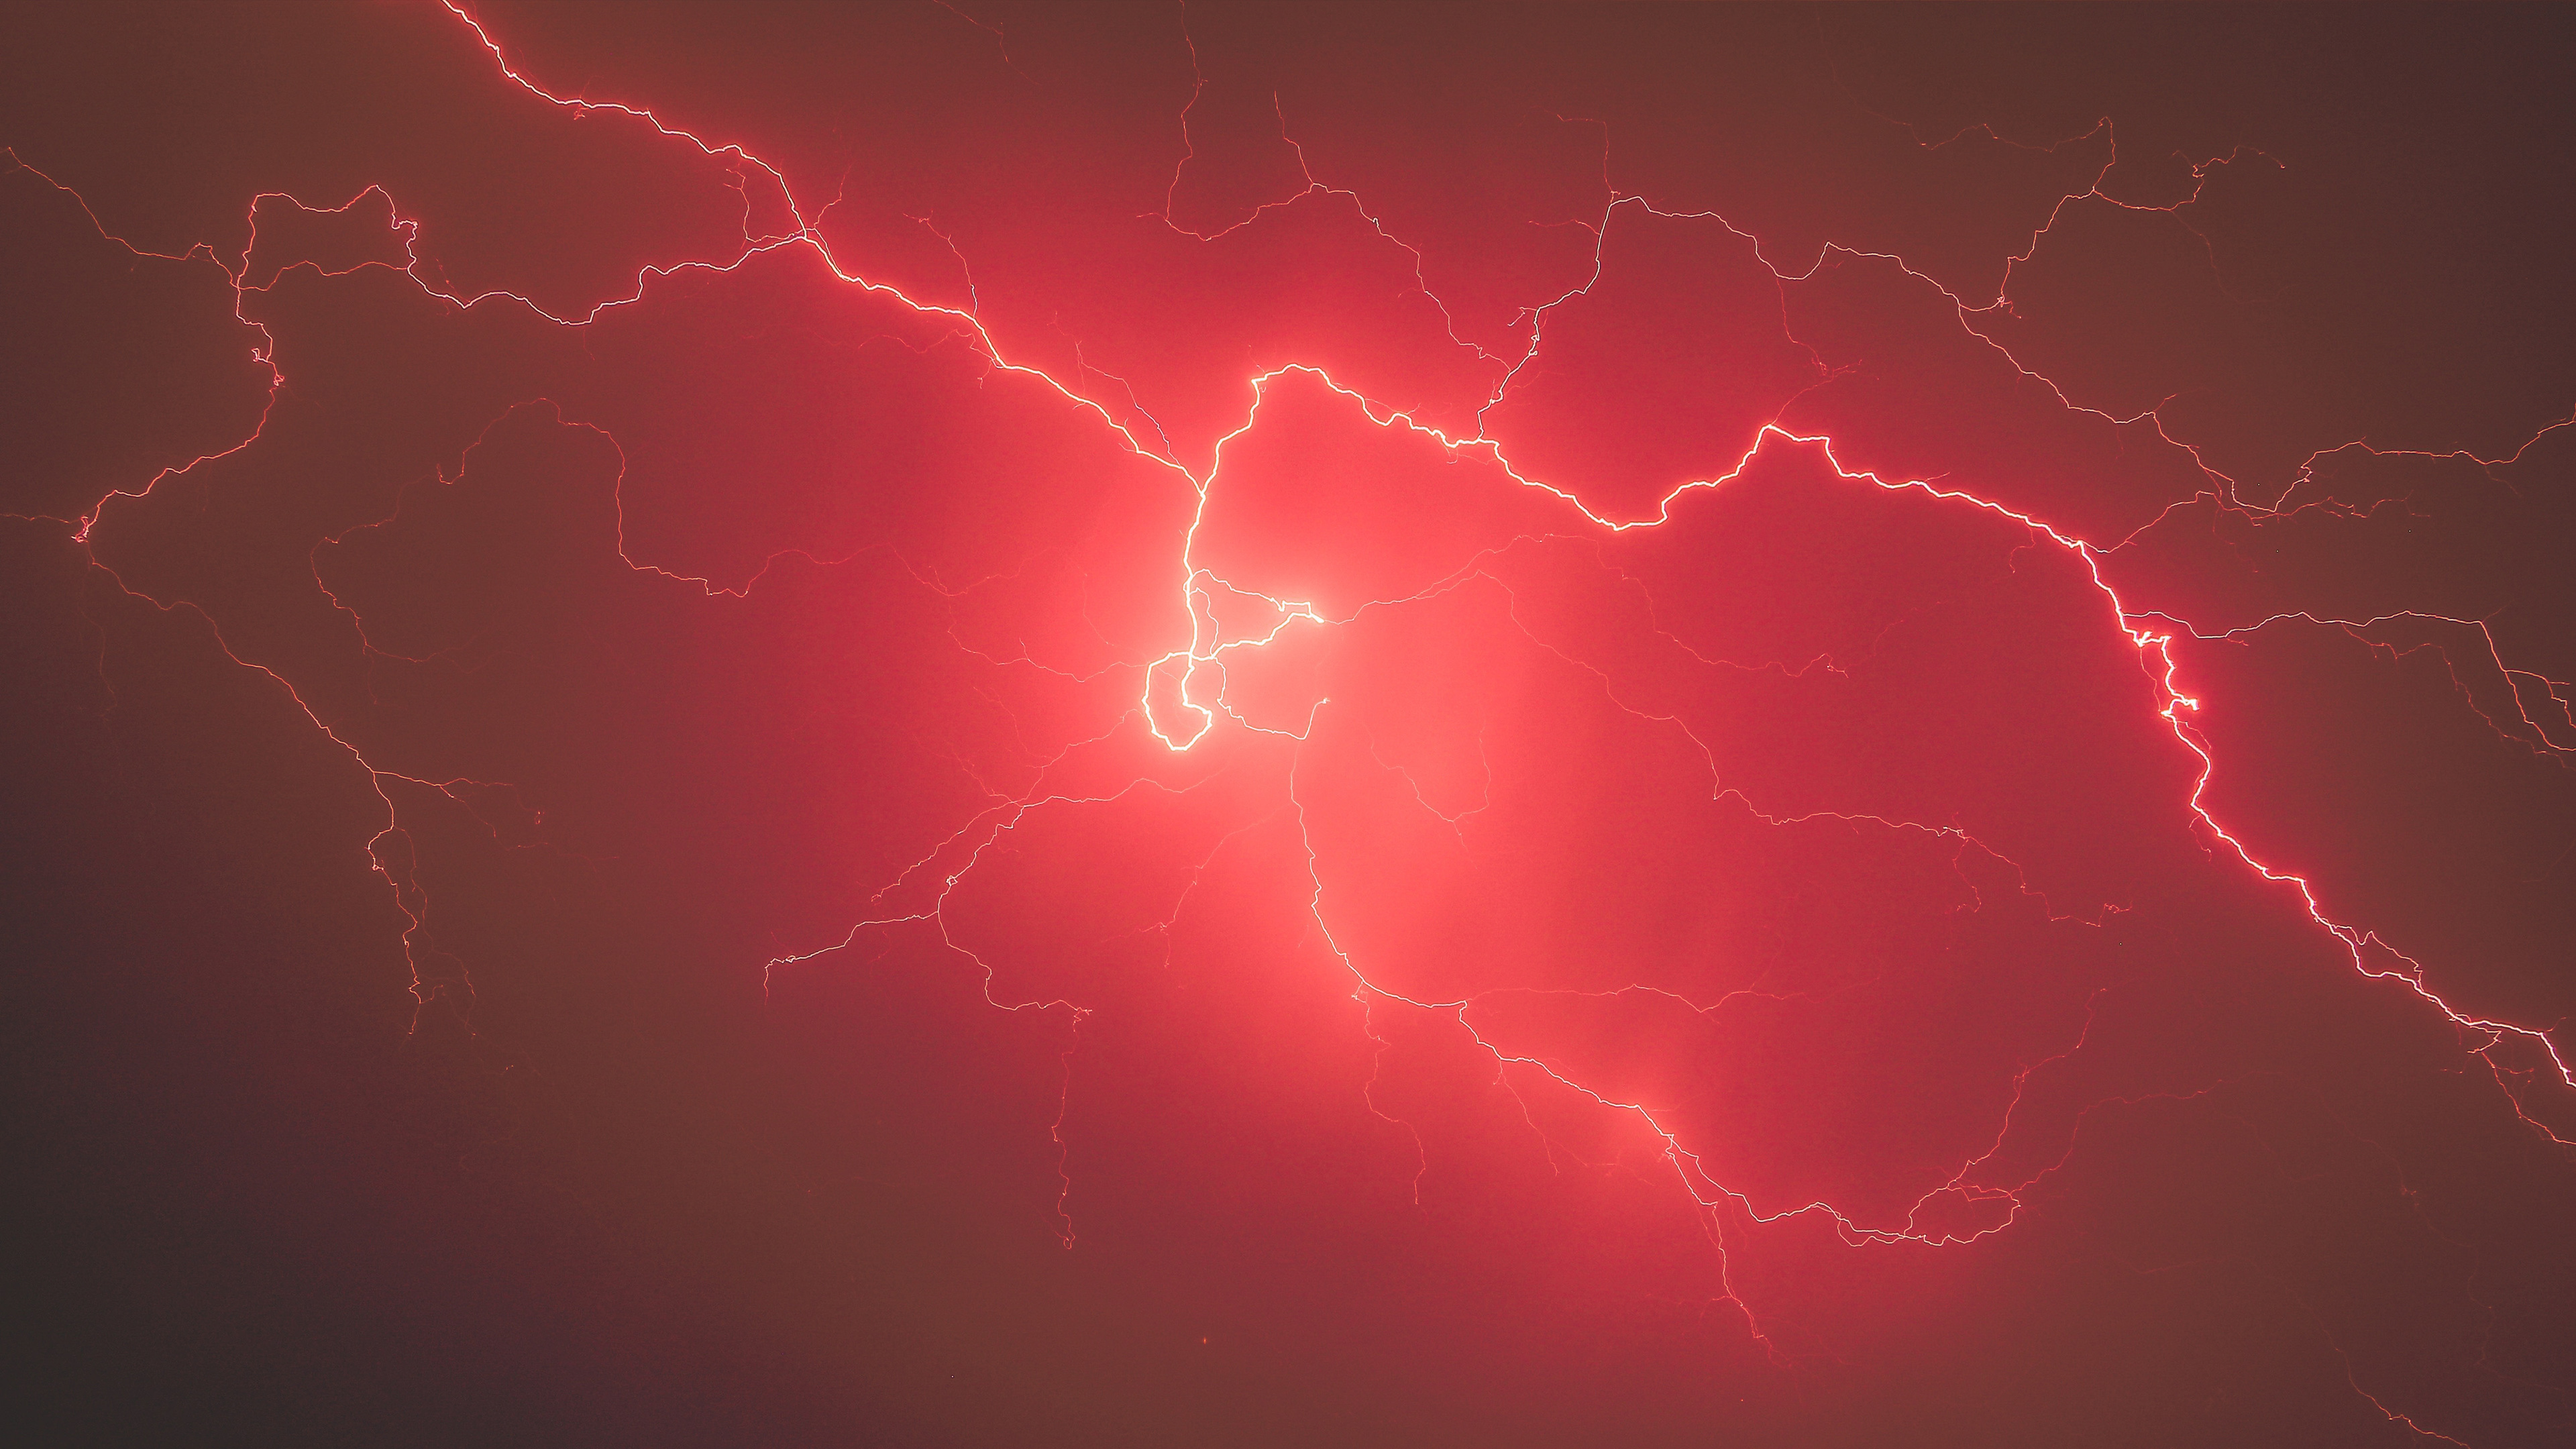 lightning storm red sky 4k 1540139473 - Lightning Storm Red Sky 4k - storm wallpapers, sky wallpapers, red wallpapers, nature wallpapers, lightning wallpapers, hd-wallpapers, 5k wallpapers, 4k-wallpapers